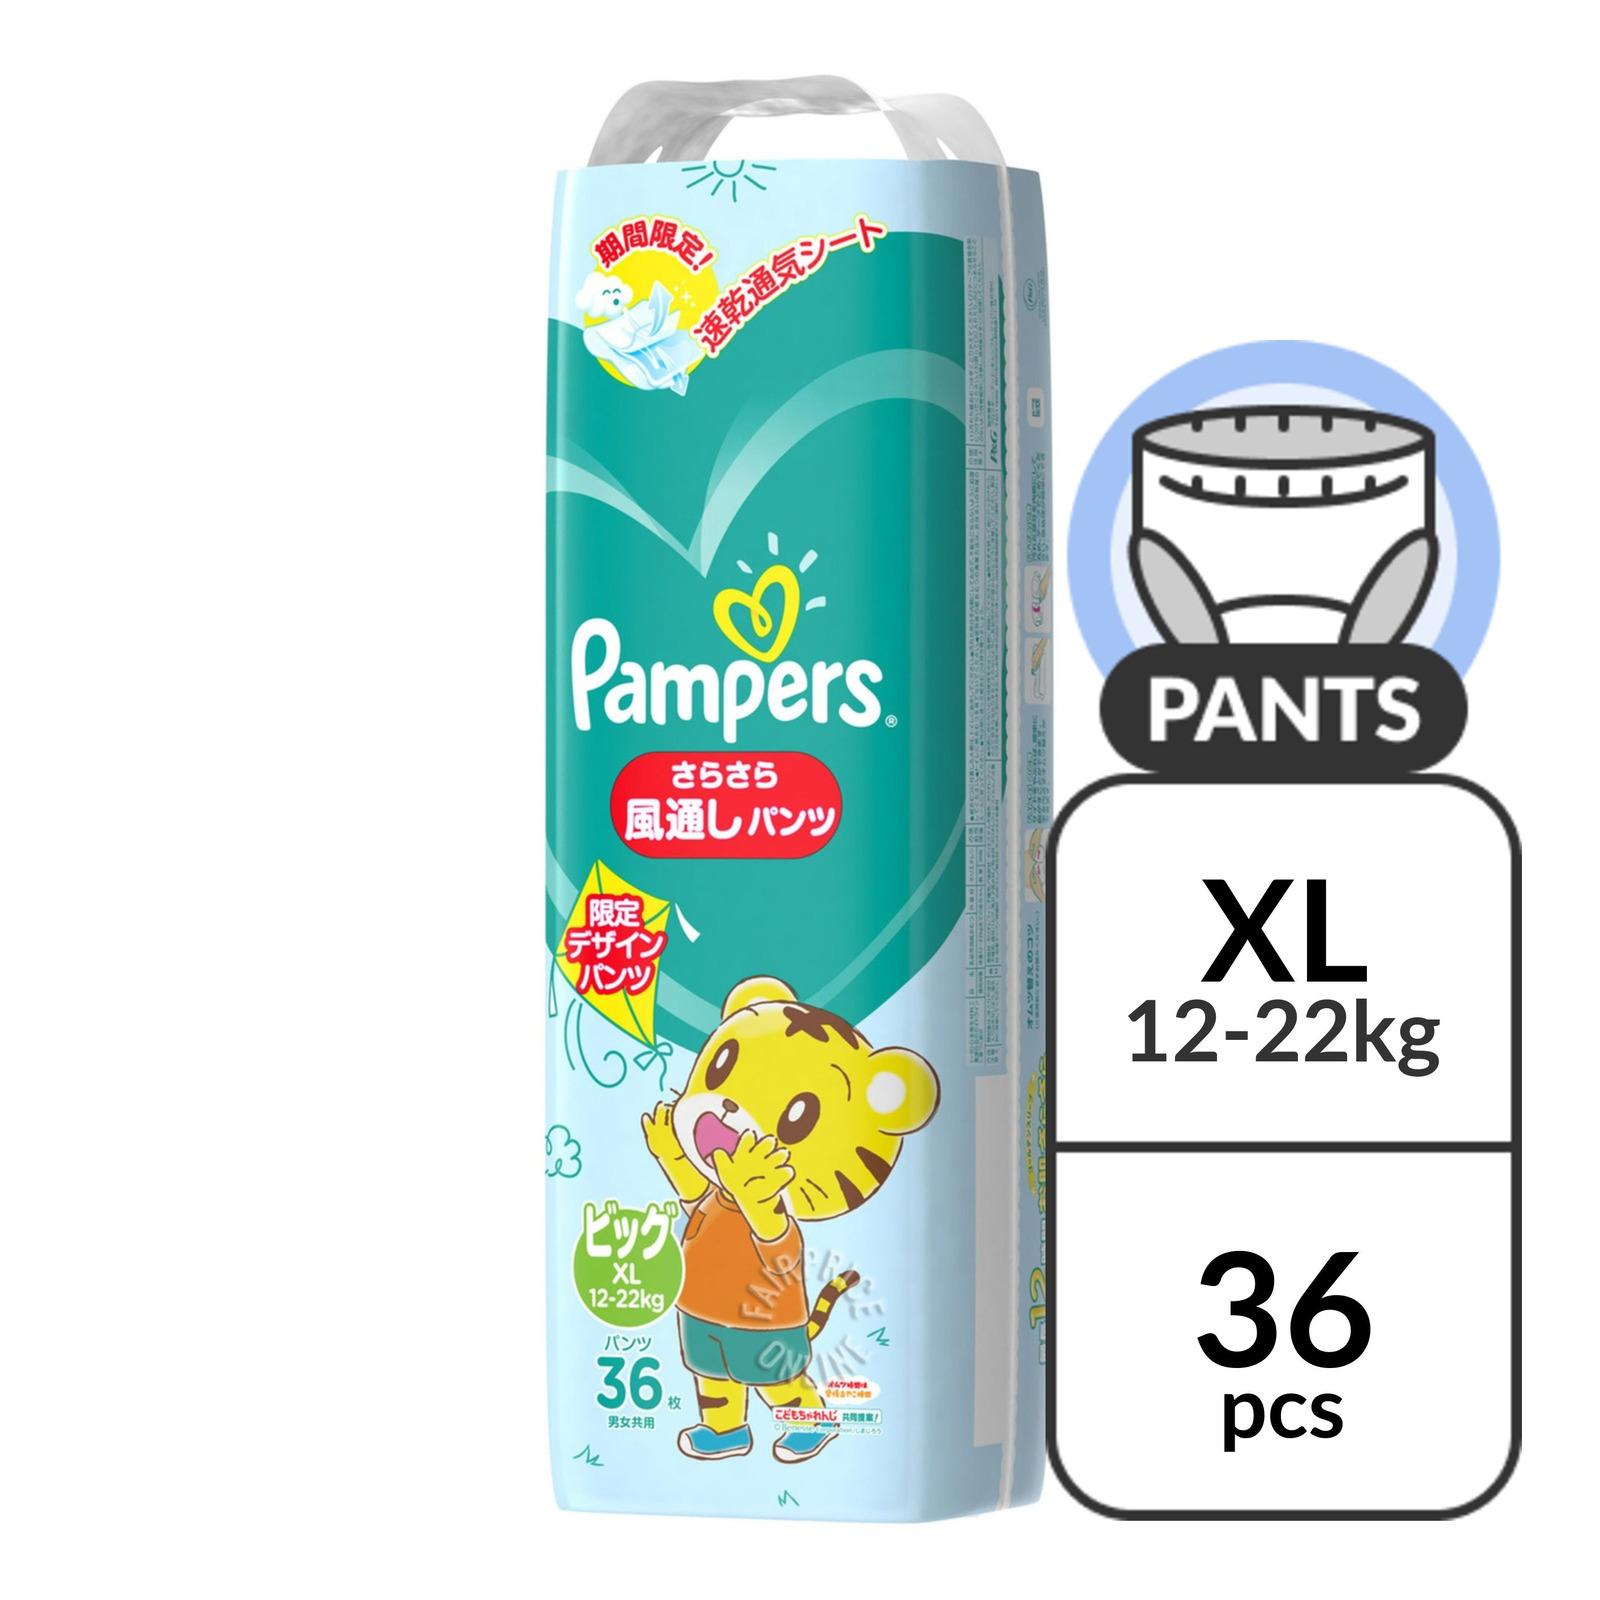 Pampers Summer Baby Diaper Pants - XL (12 - 22kg)